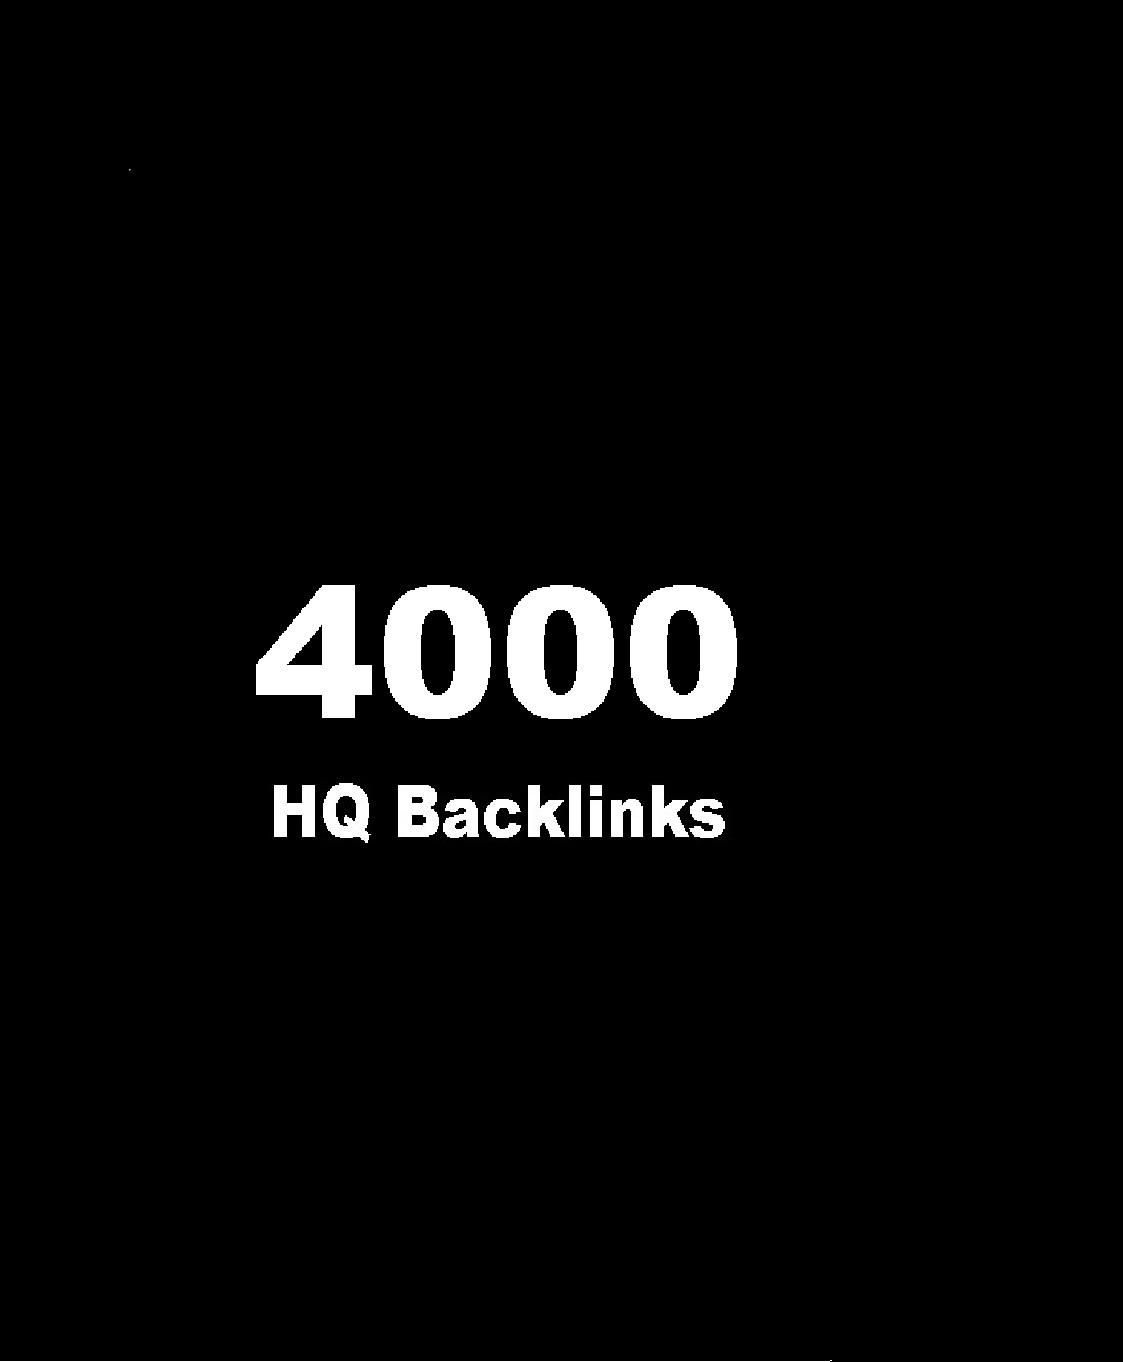 4000 Forum profiles posting backlinks High PR Backlinks and rank higher on Google.